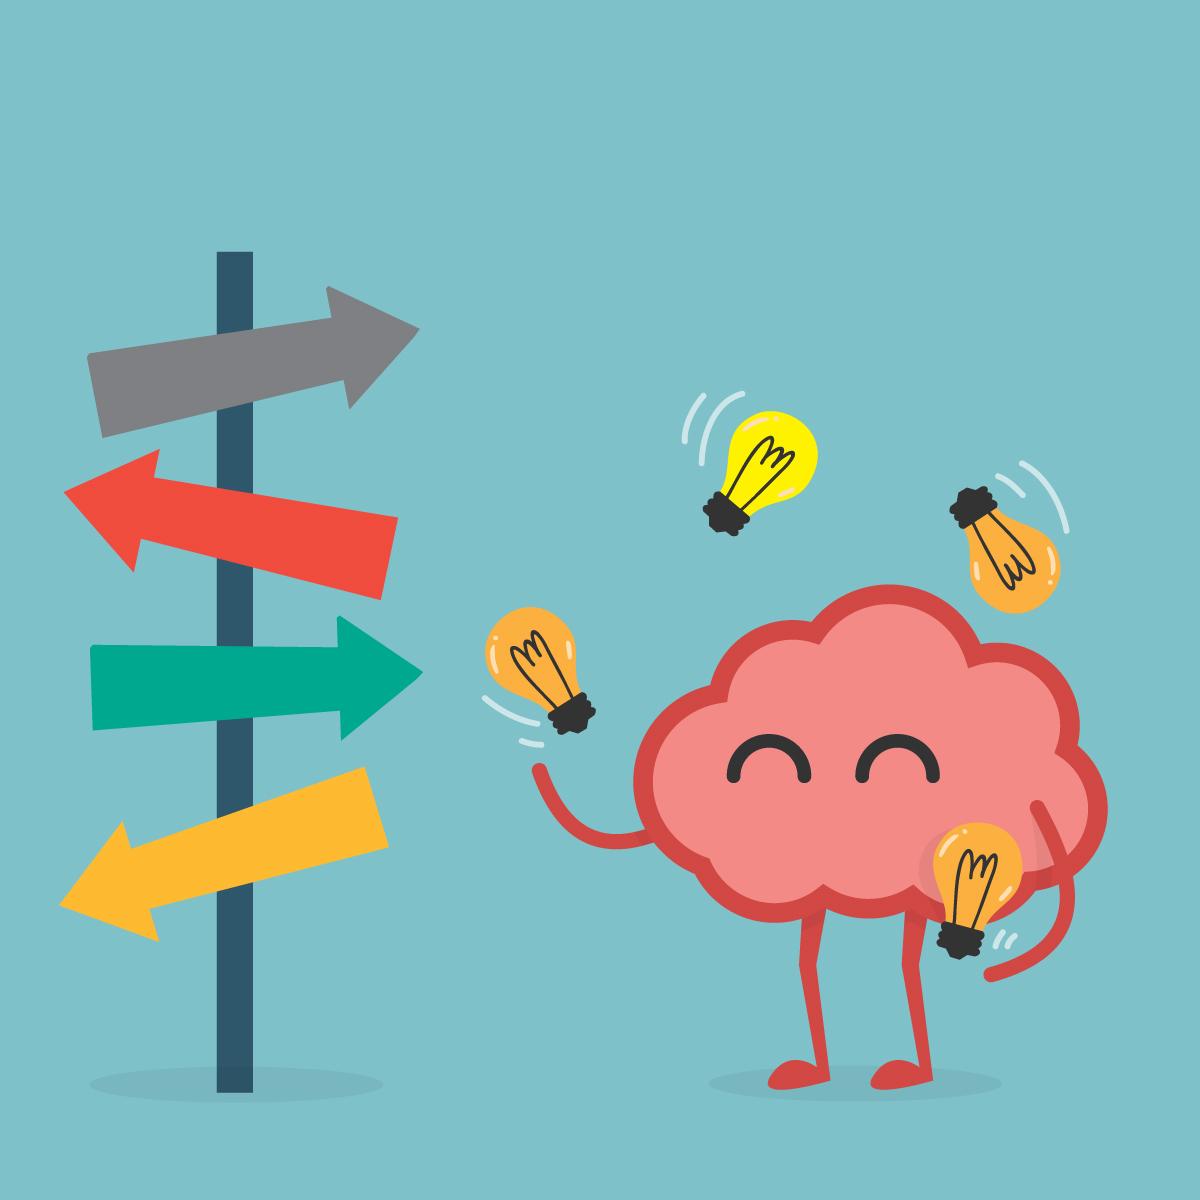 conclusion de aprender a tomar decisiones de manera informada